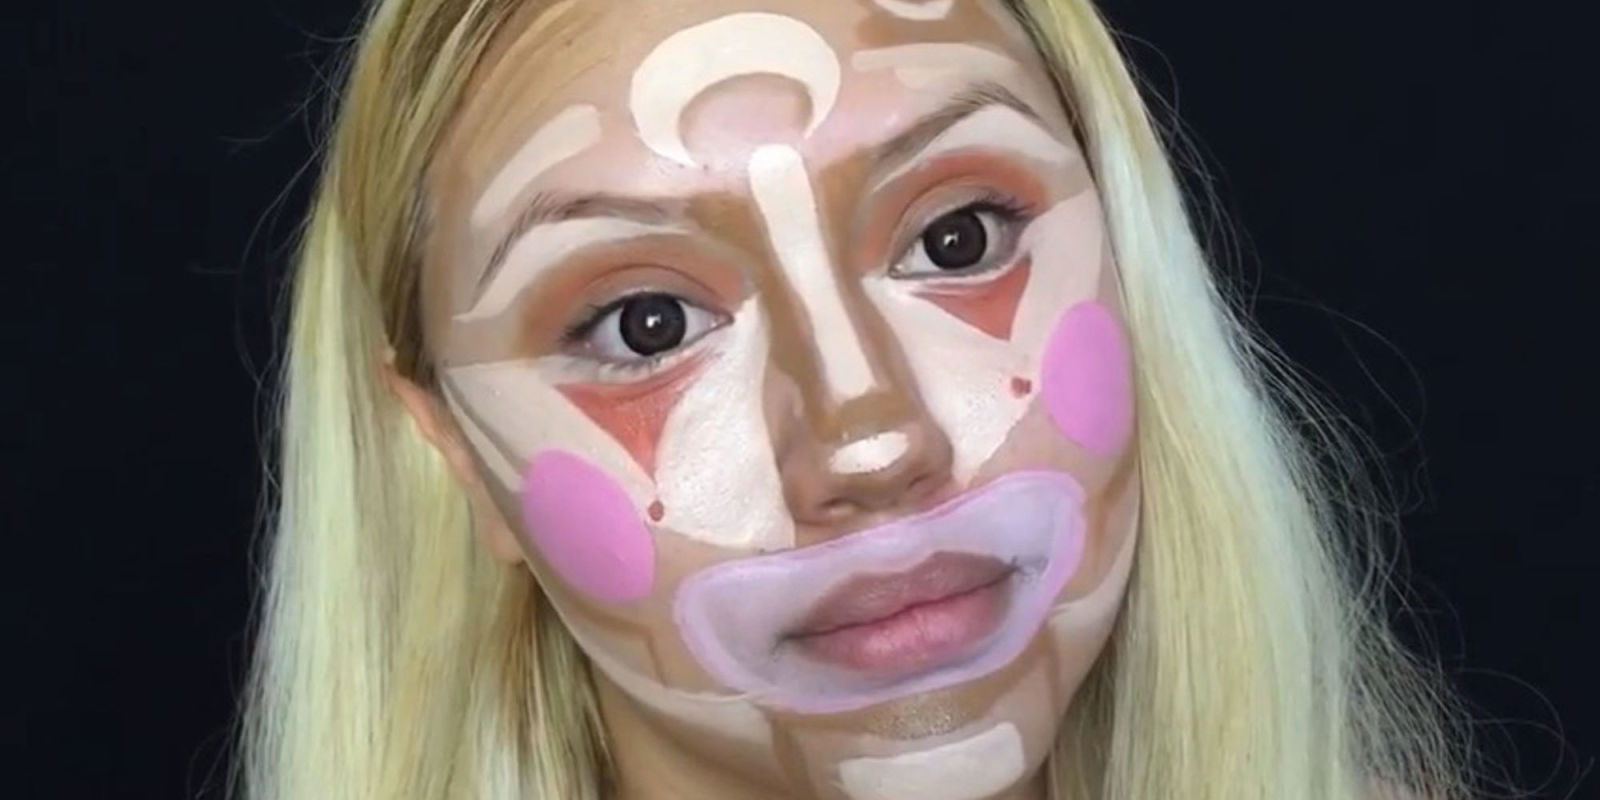 'Clown contouring': ¿Por qué pintarse como un payaso es tendencia?